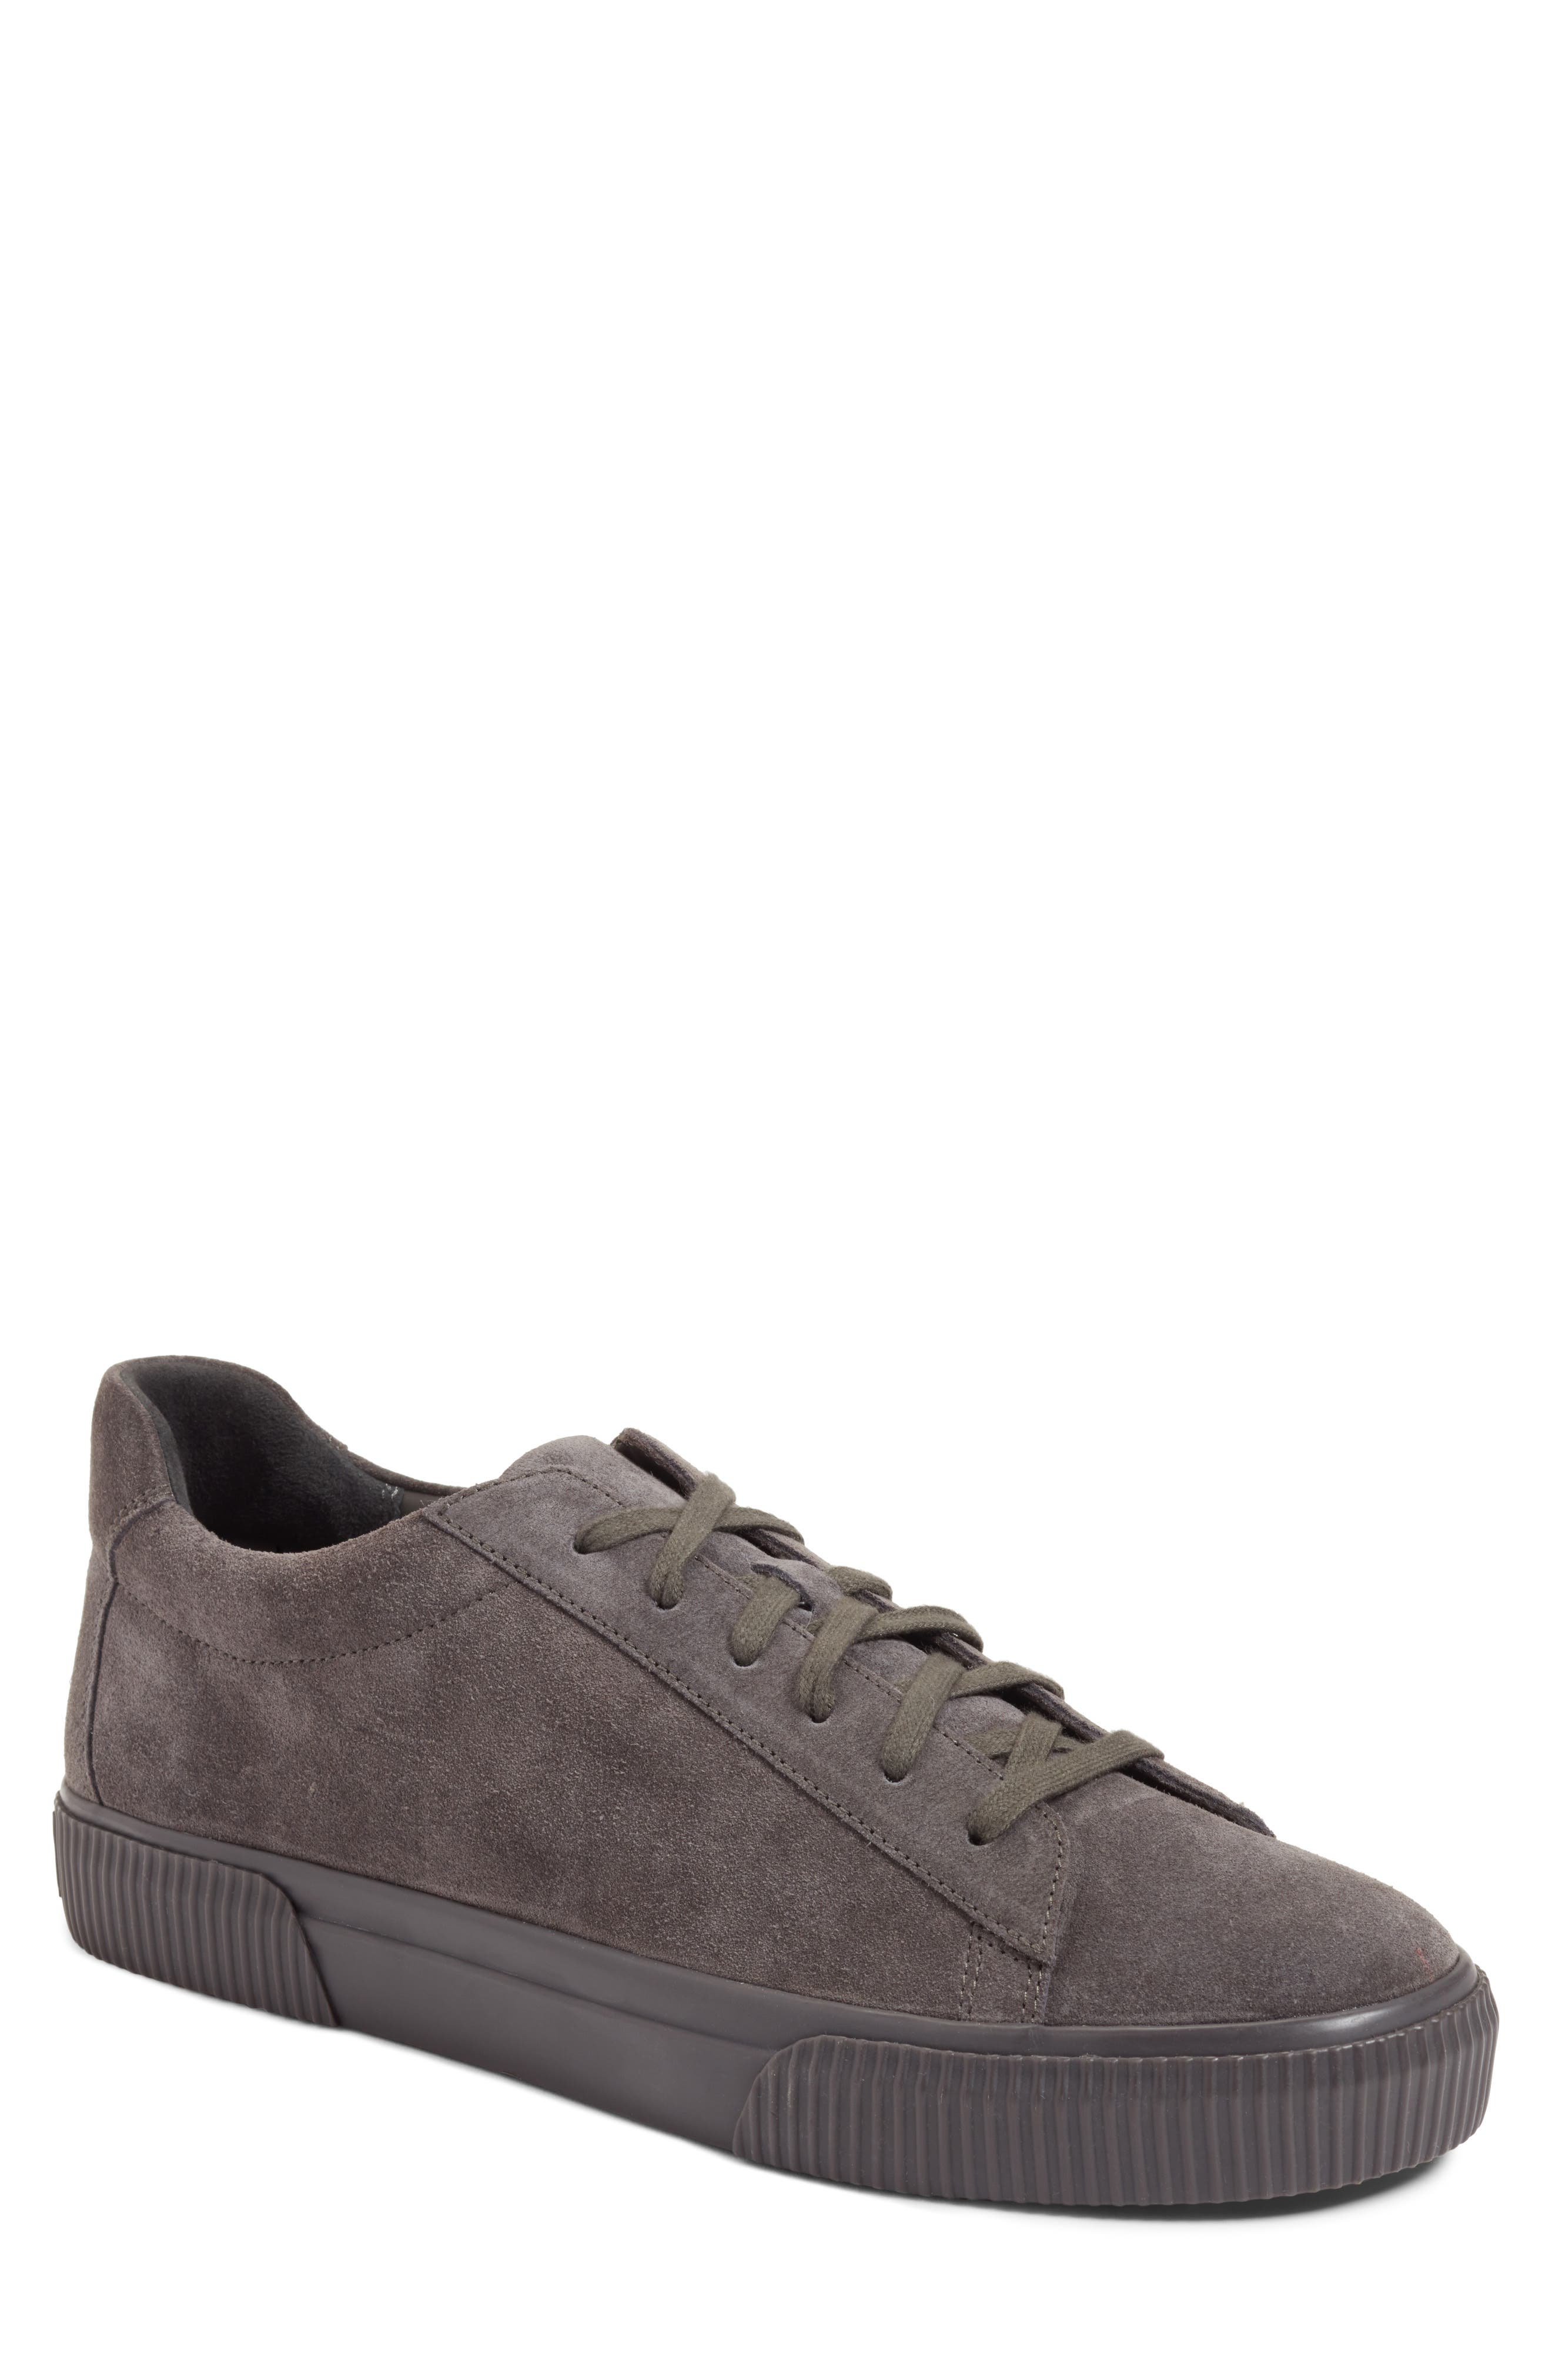 Alternate Image 1 Selected - Vince Kurtis Sneaker (Men)